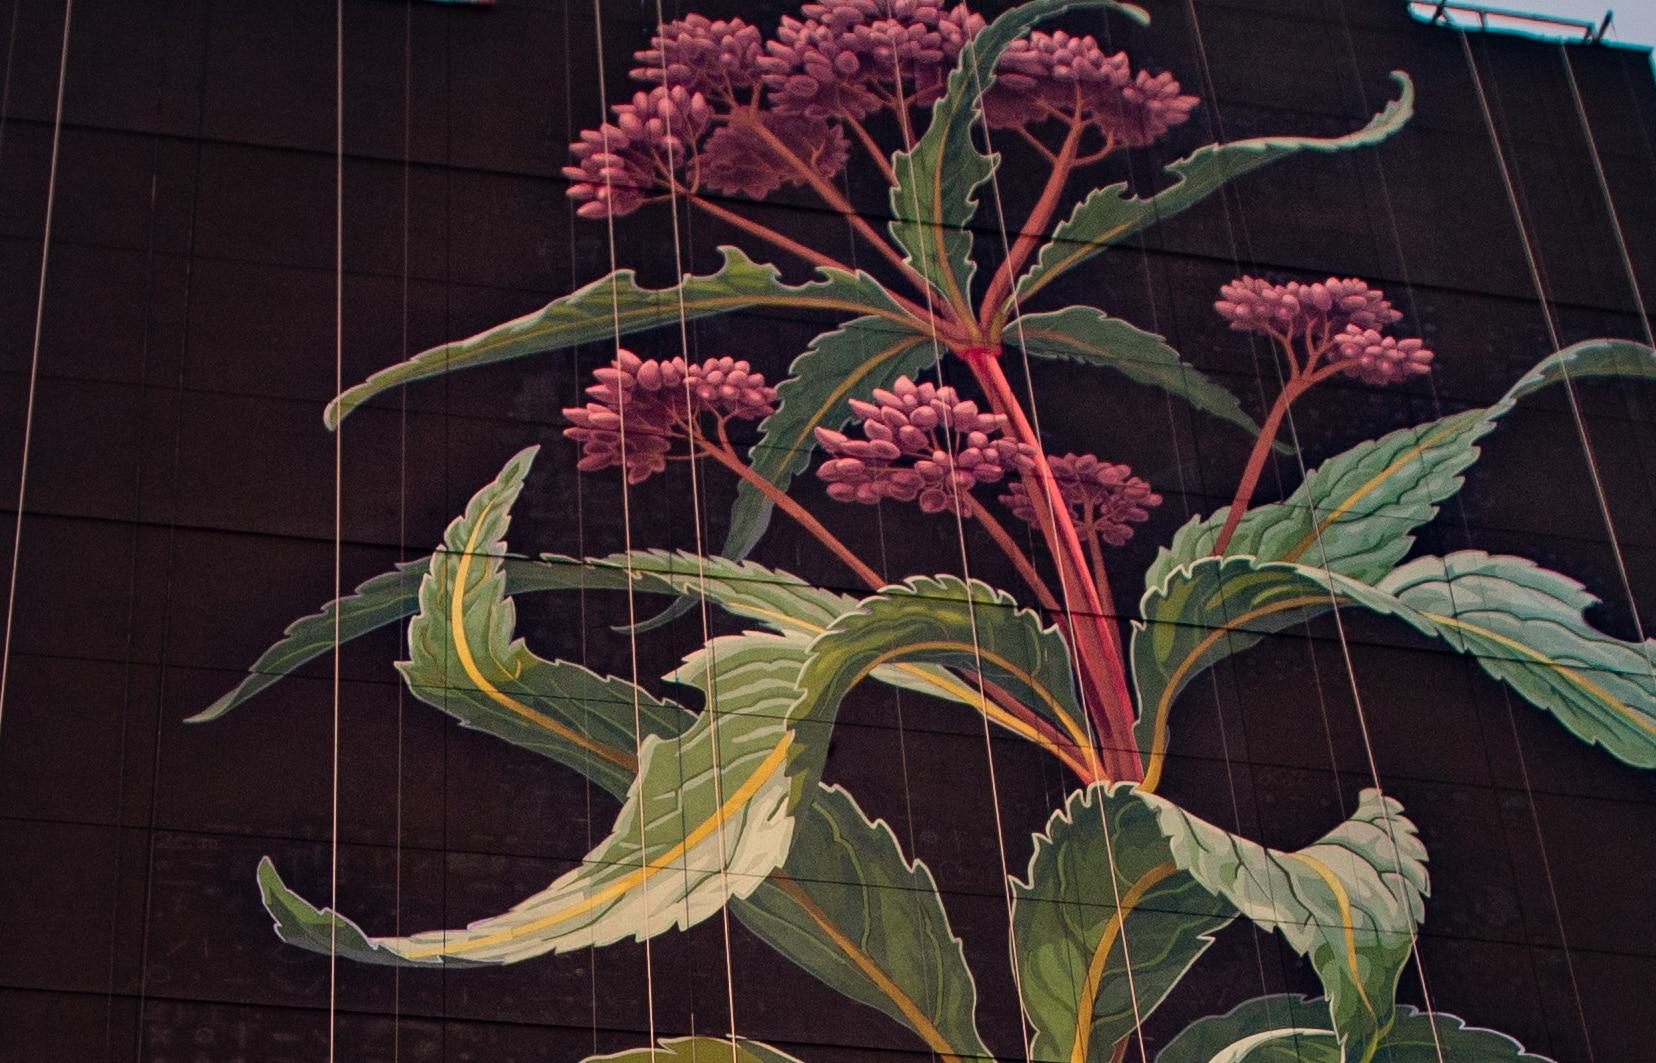 mona caron mural flor silvestre color